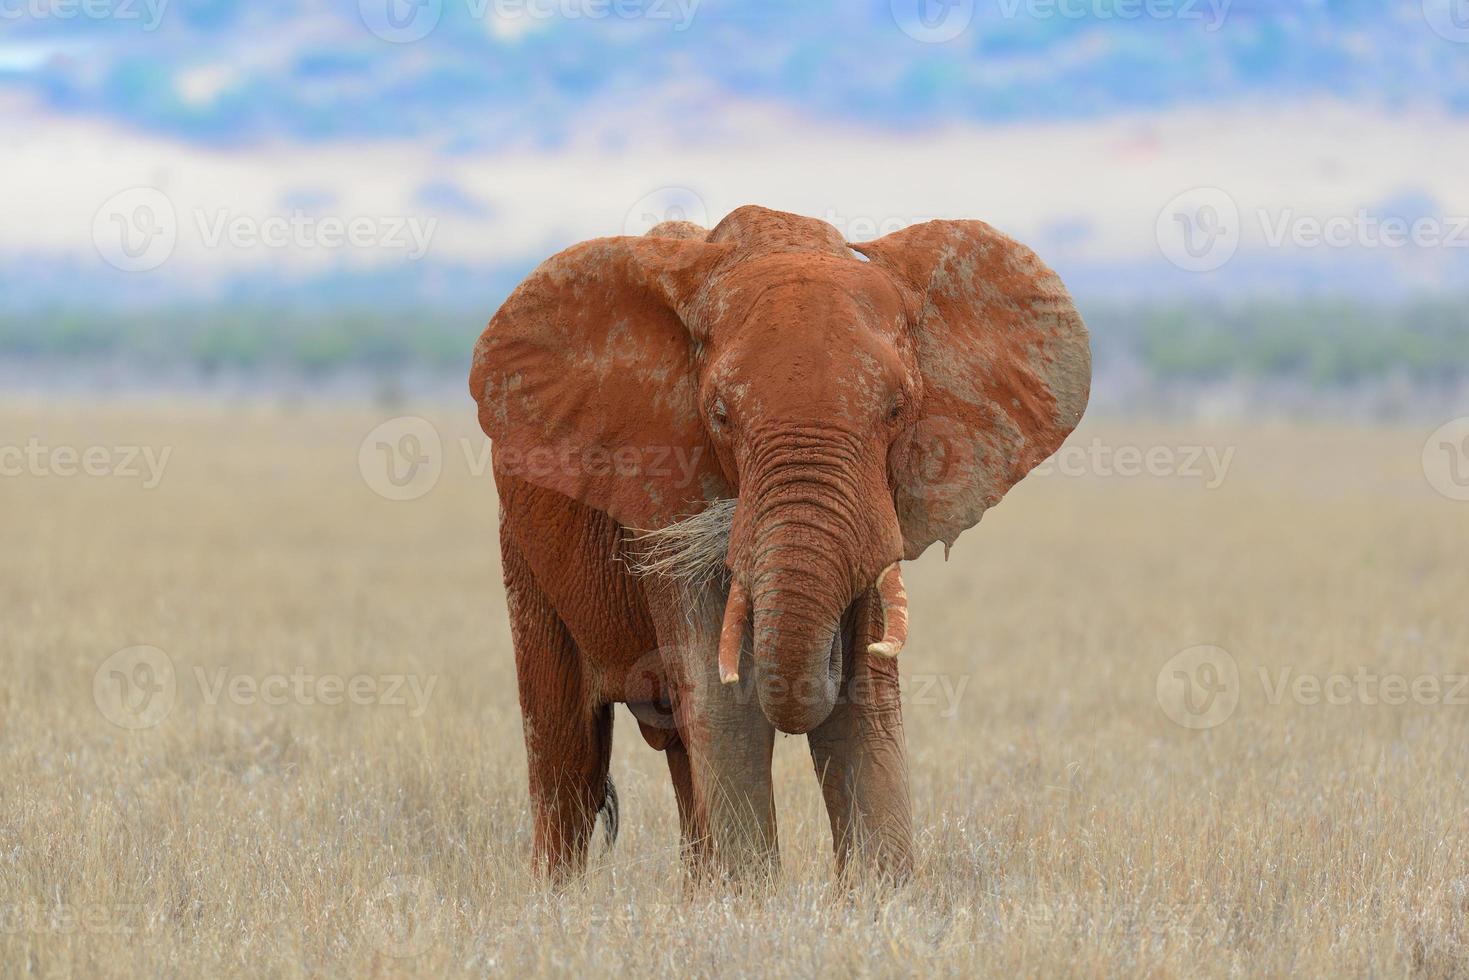 Elephant in National park of Kenya photo